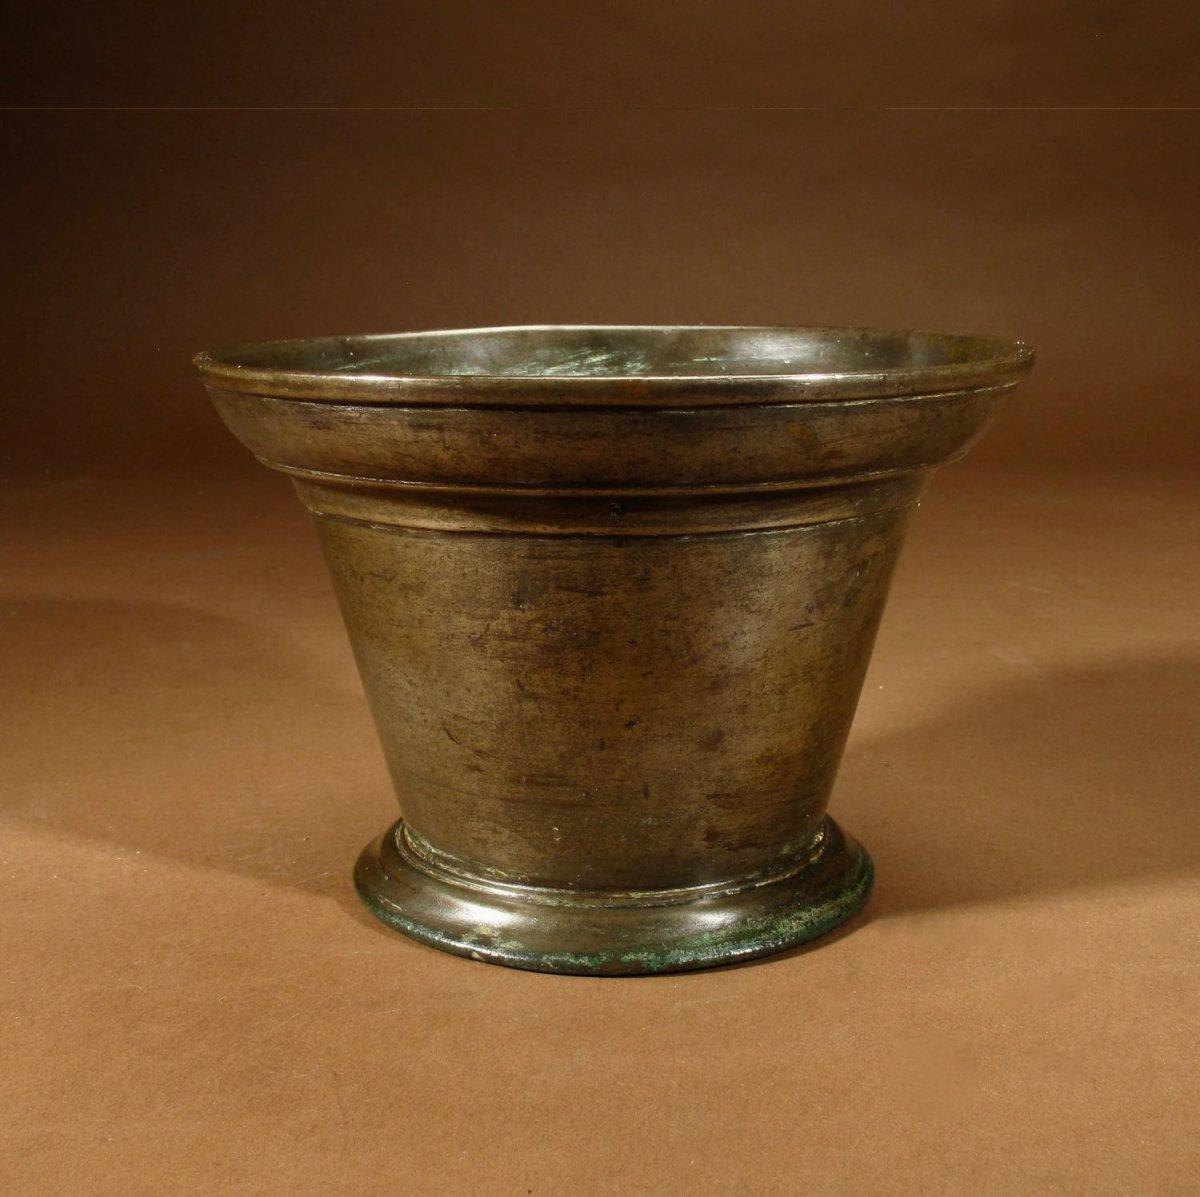 Un Beau Mortier En Bronze Uni, Continental, XVIIe / XVIIIe Siècle